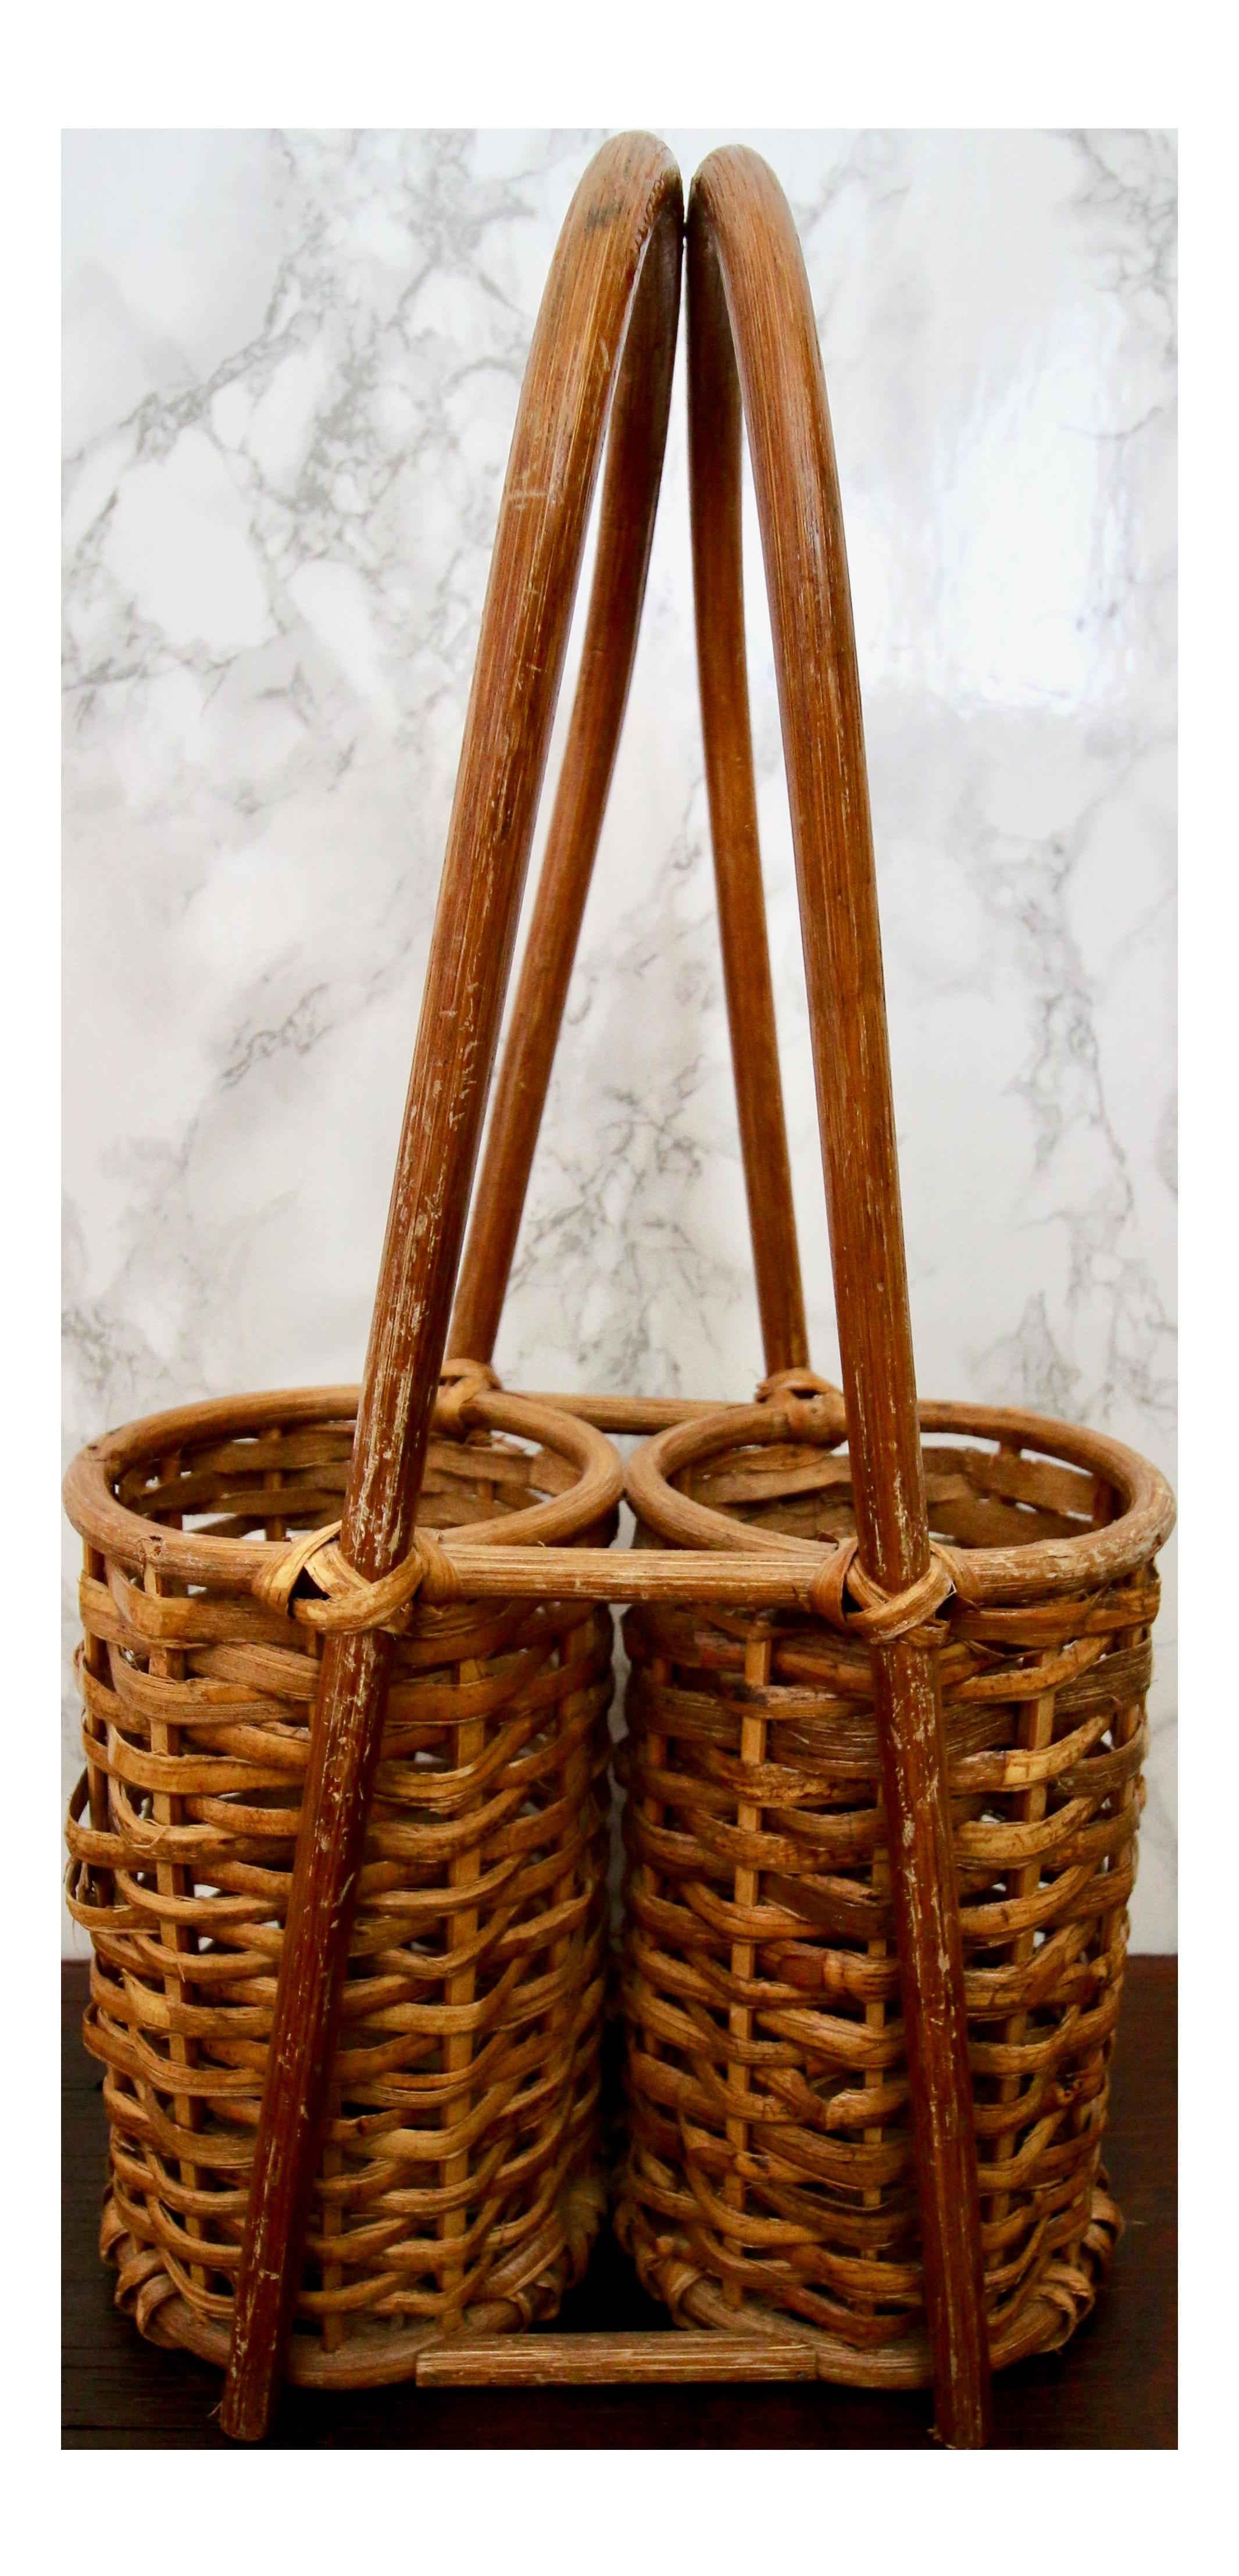 Bamboo Rattan Double Wine 2 Bottle Holder Caddy Basket | Chairish